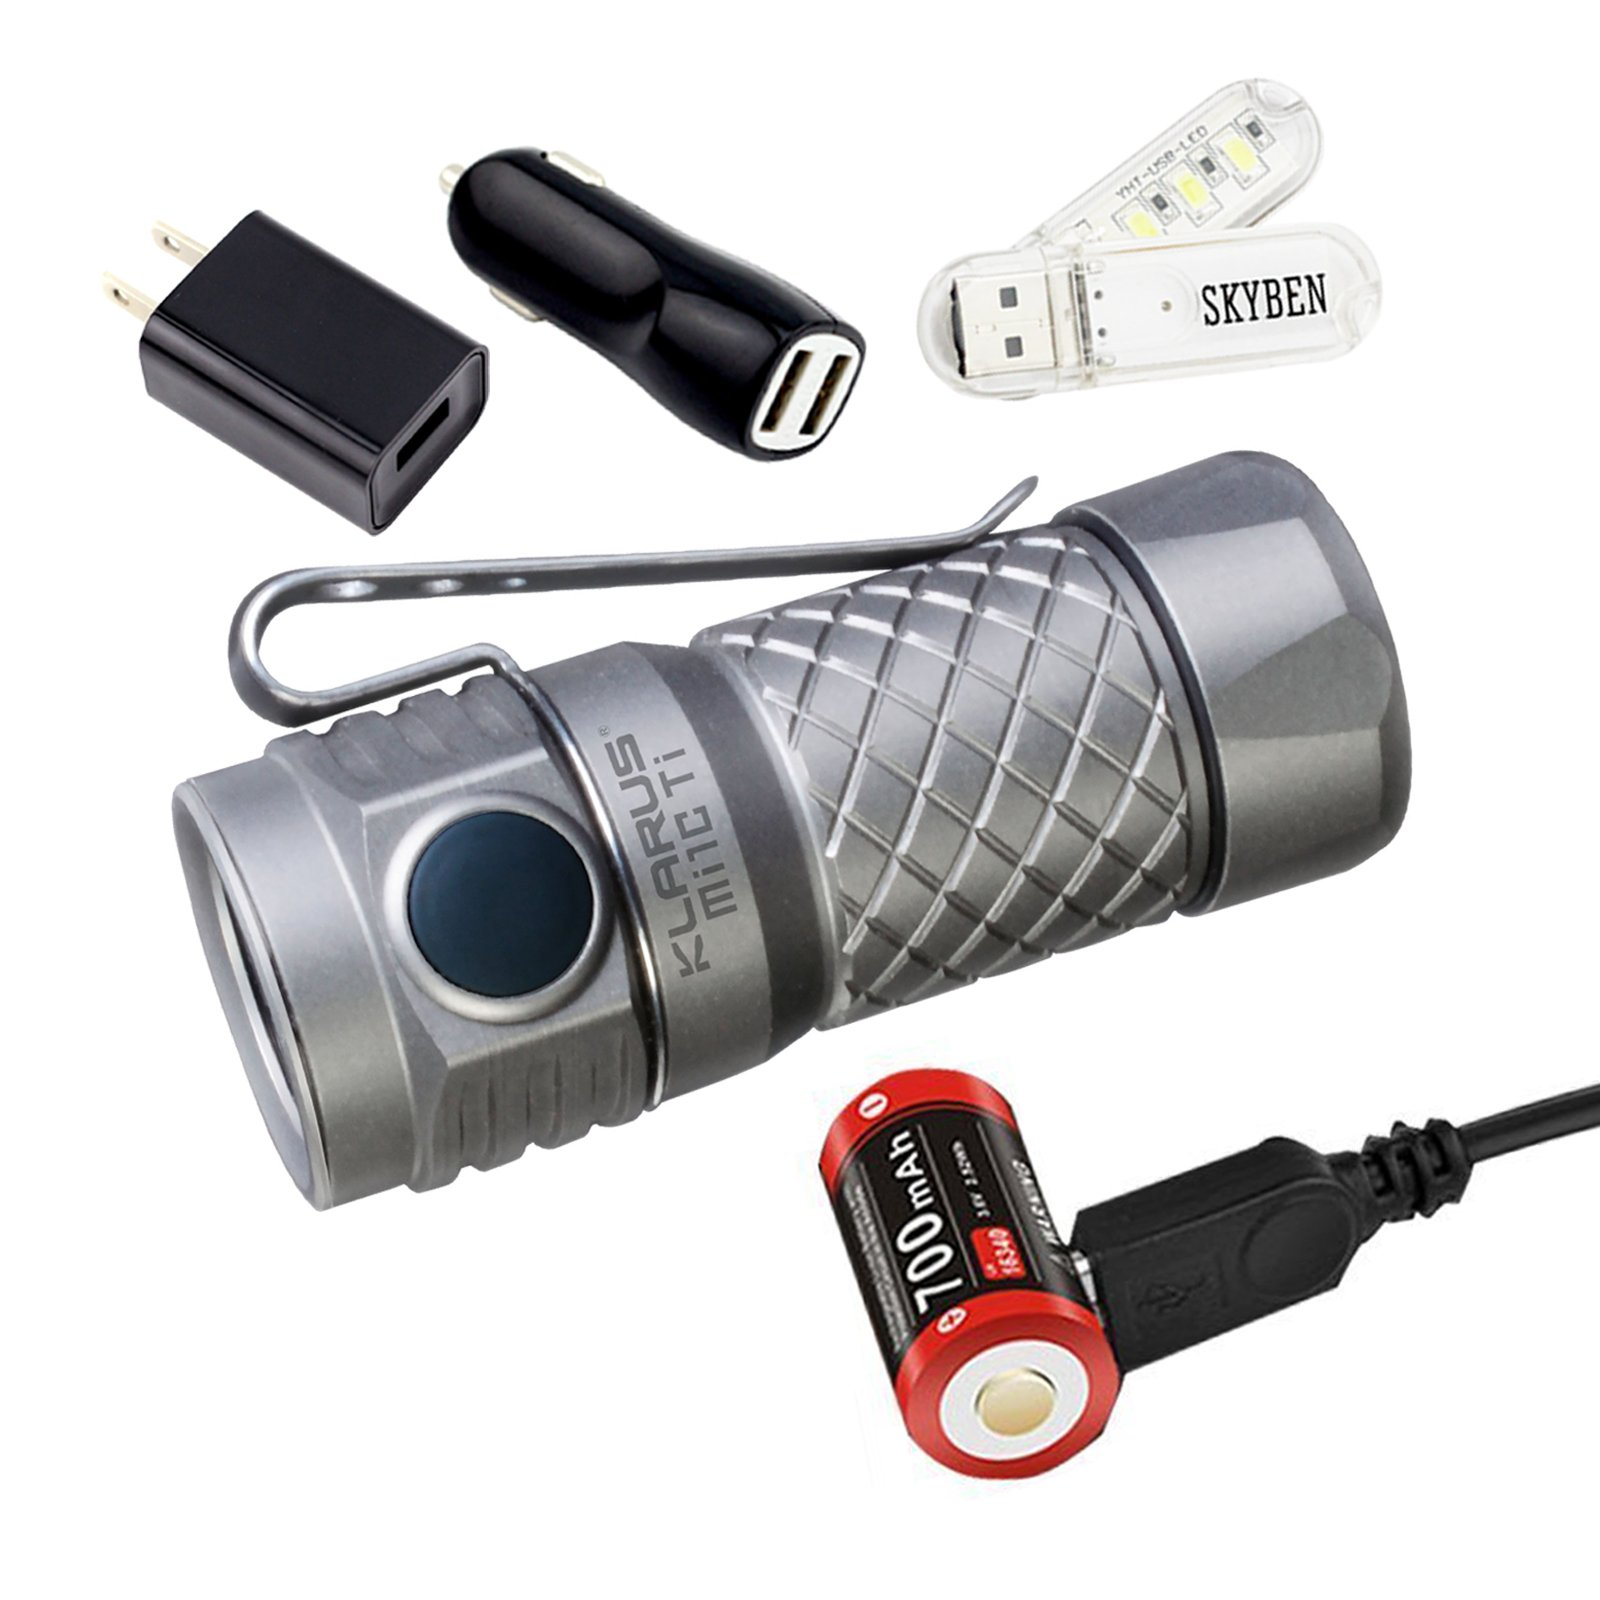 Klarus Mi1C 600 Lumens CREE XP-L HI V3 LED Side Switch EDC Flashlight 16340 Mini Bright Flashlight, with 1x16340 Battery,Charging Cable,O-ring and SKYBEN USB Light (Titanium)